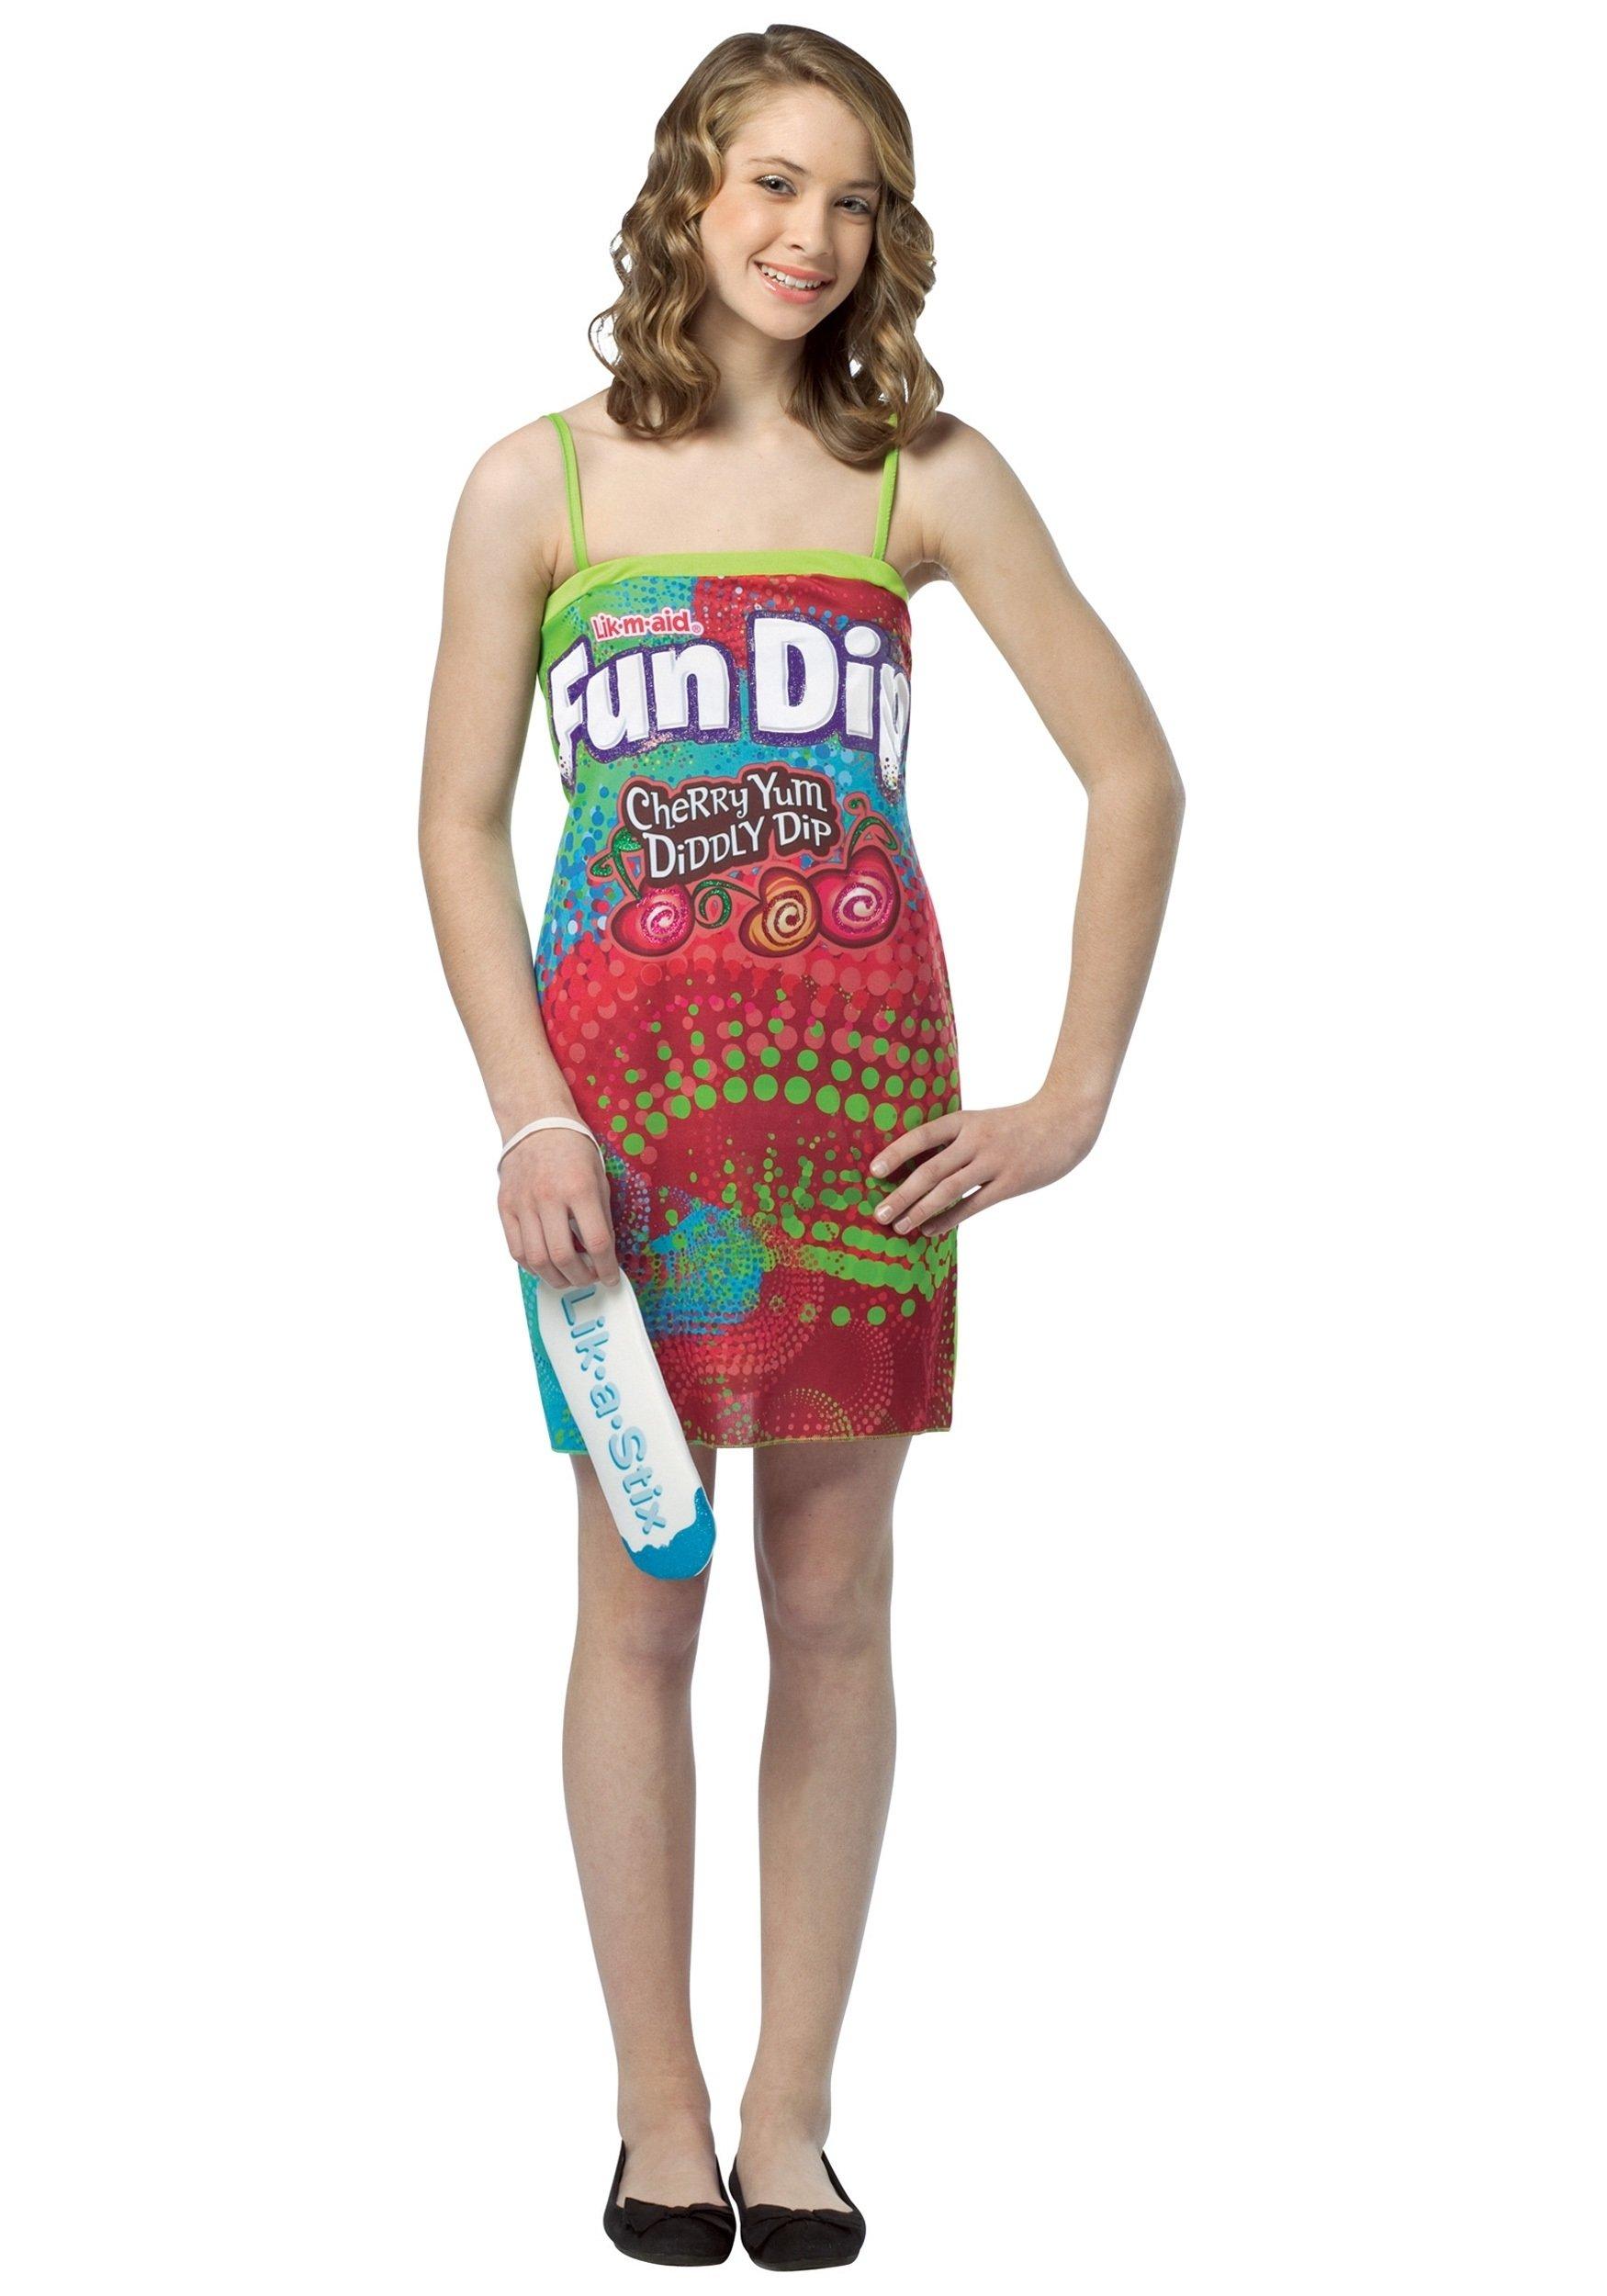 10 Famous Halloween Costume Ideas Teenage Girl teen fun dip dress halloween pinterest teen fun fun dip and 2020